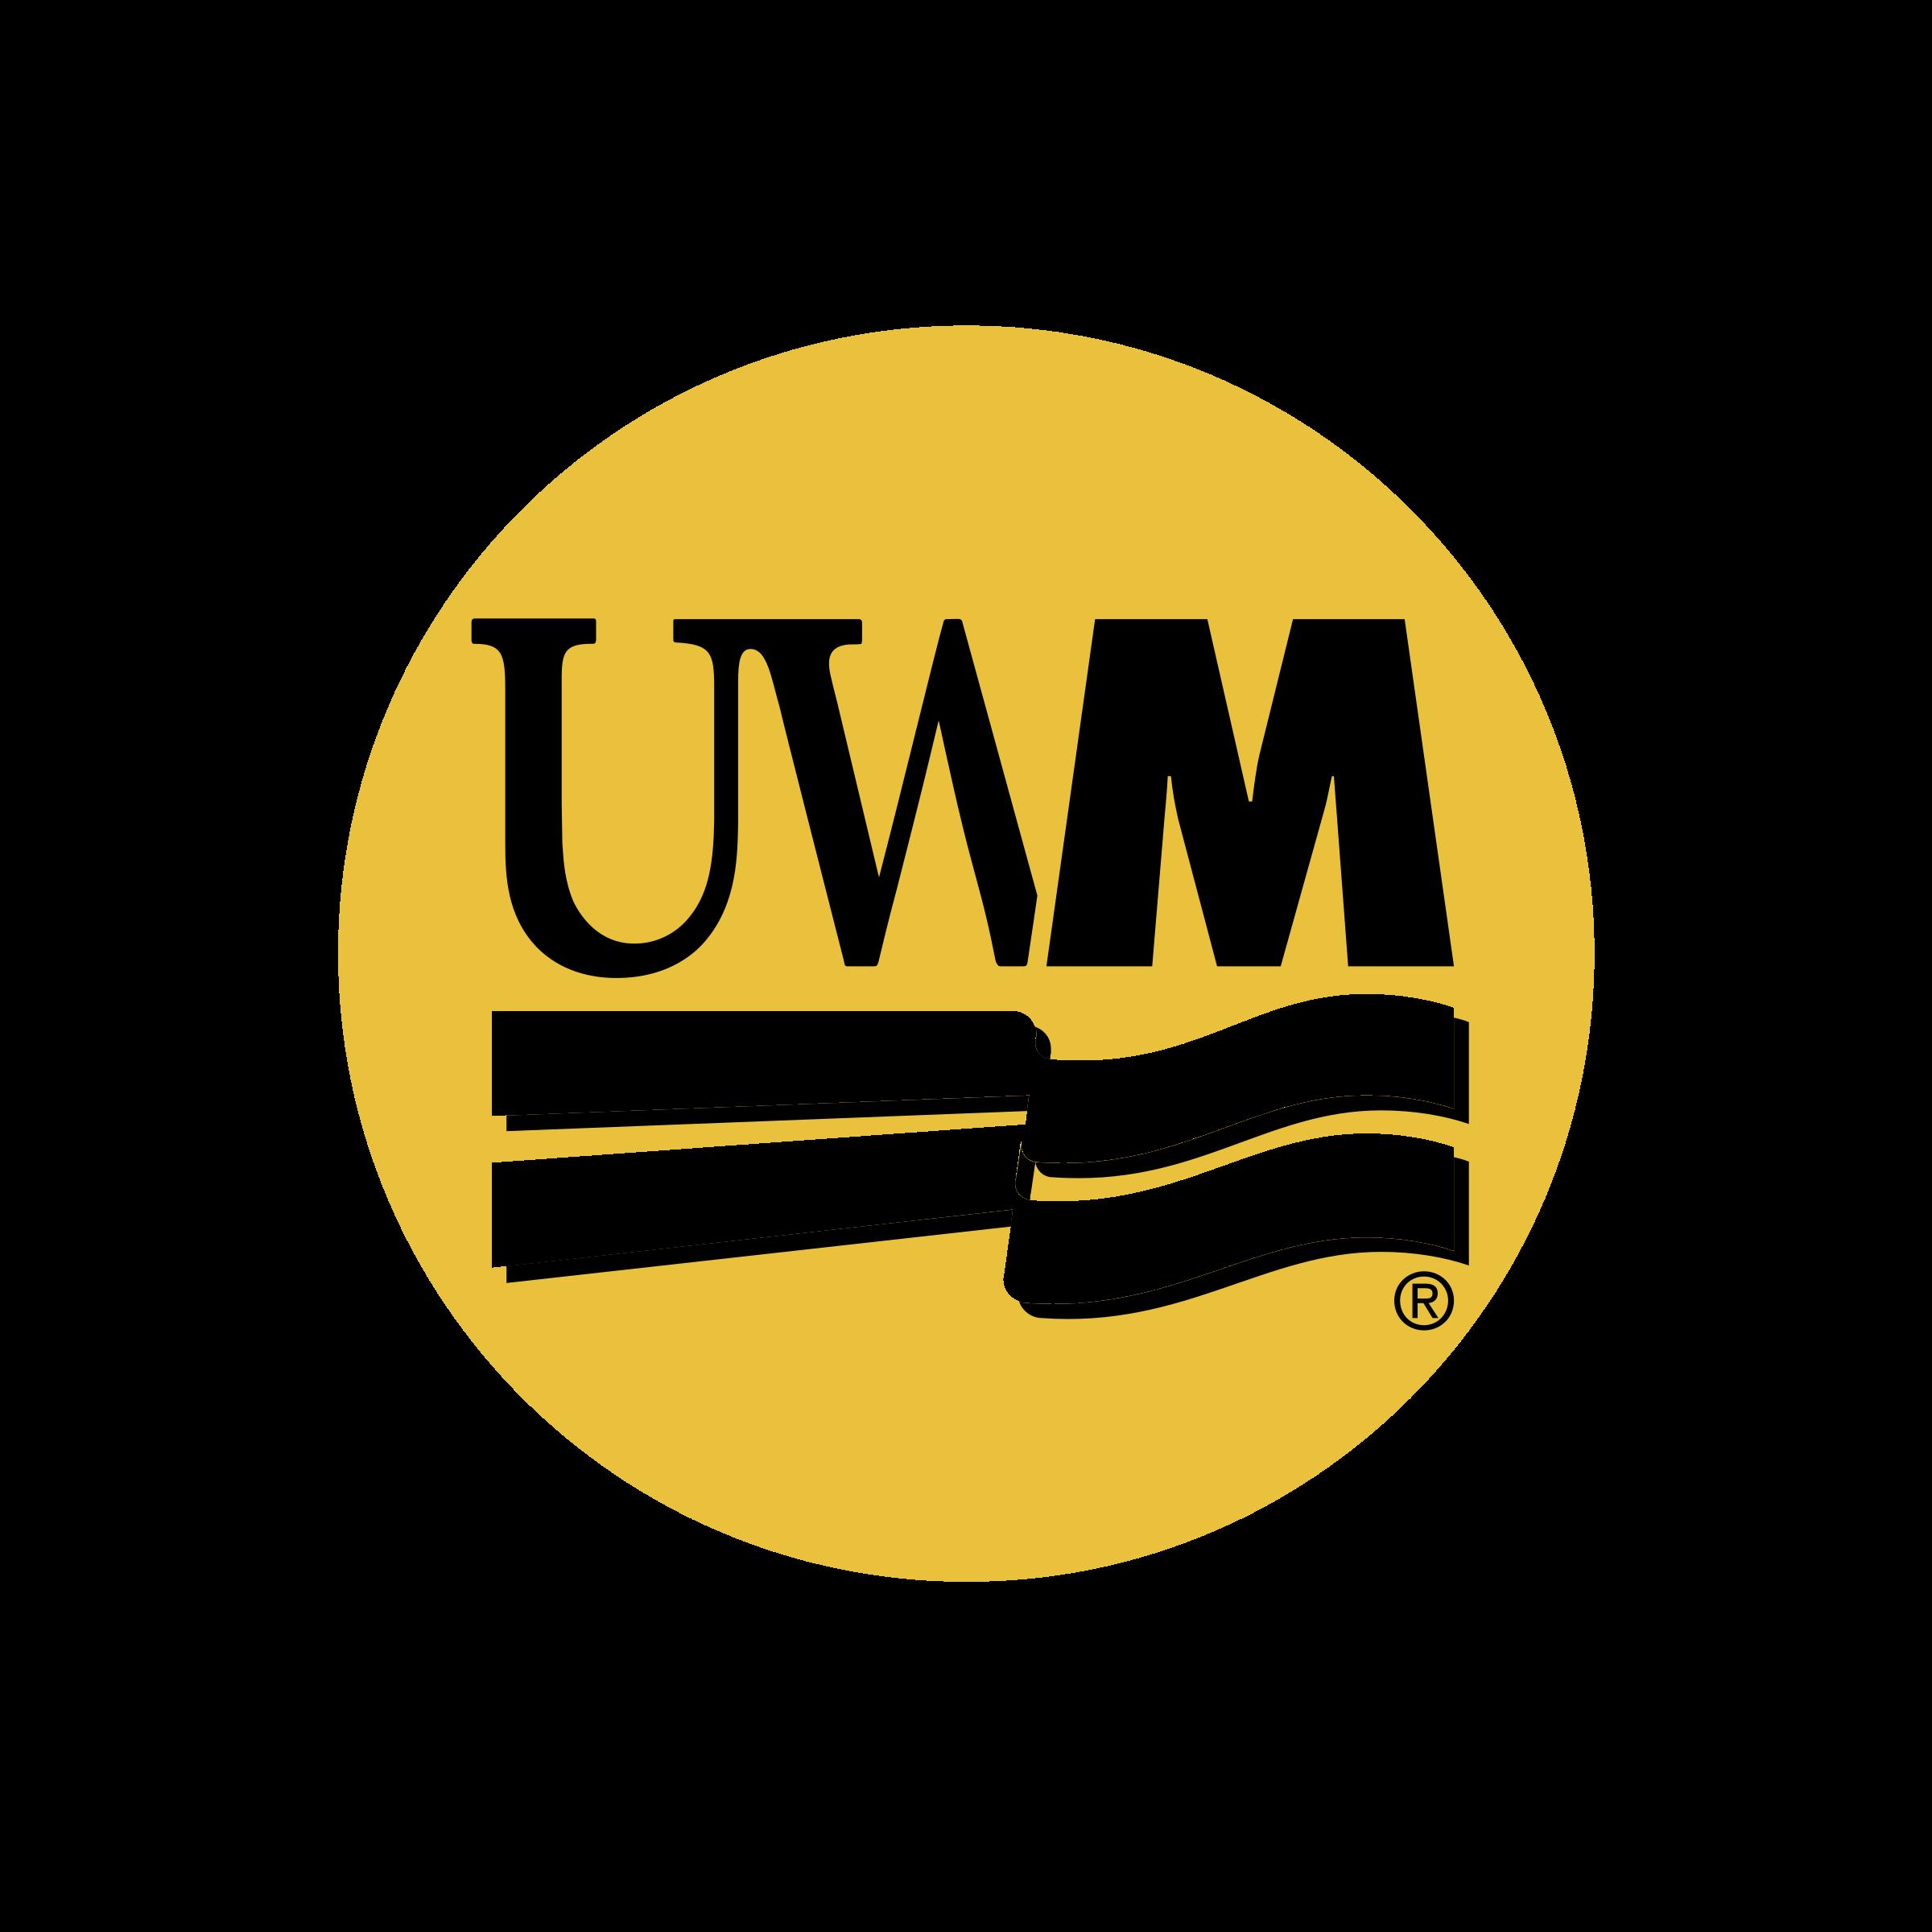 university-of-wisconsin-milwaukee-5-logo-png-transparent.png